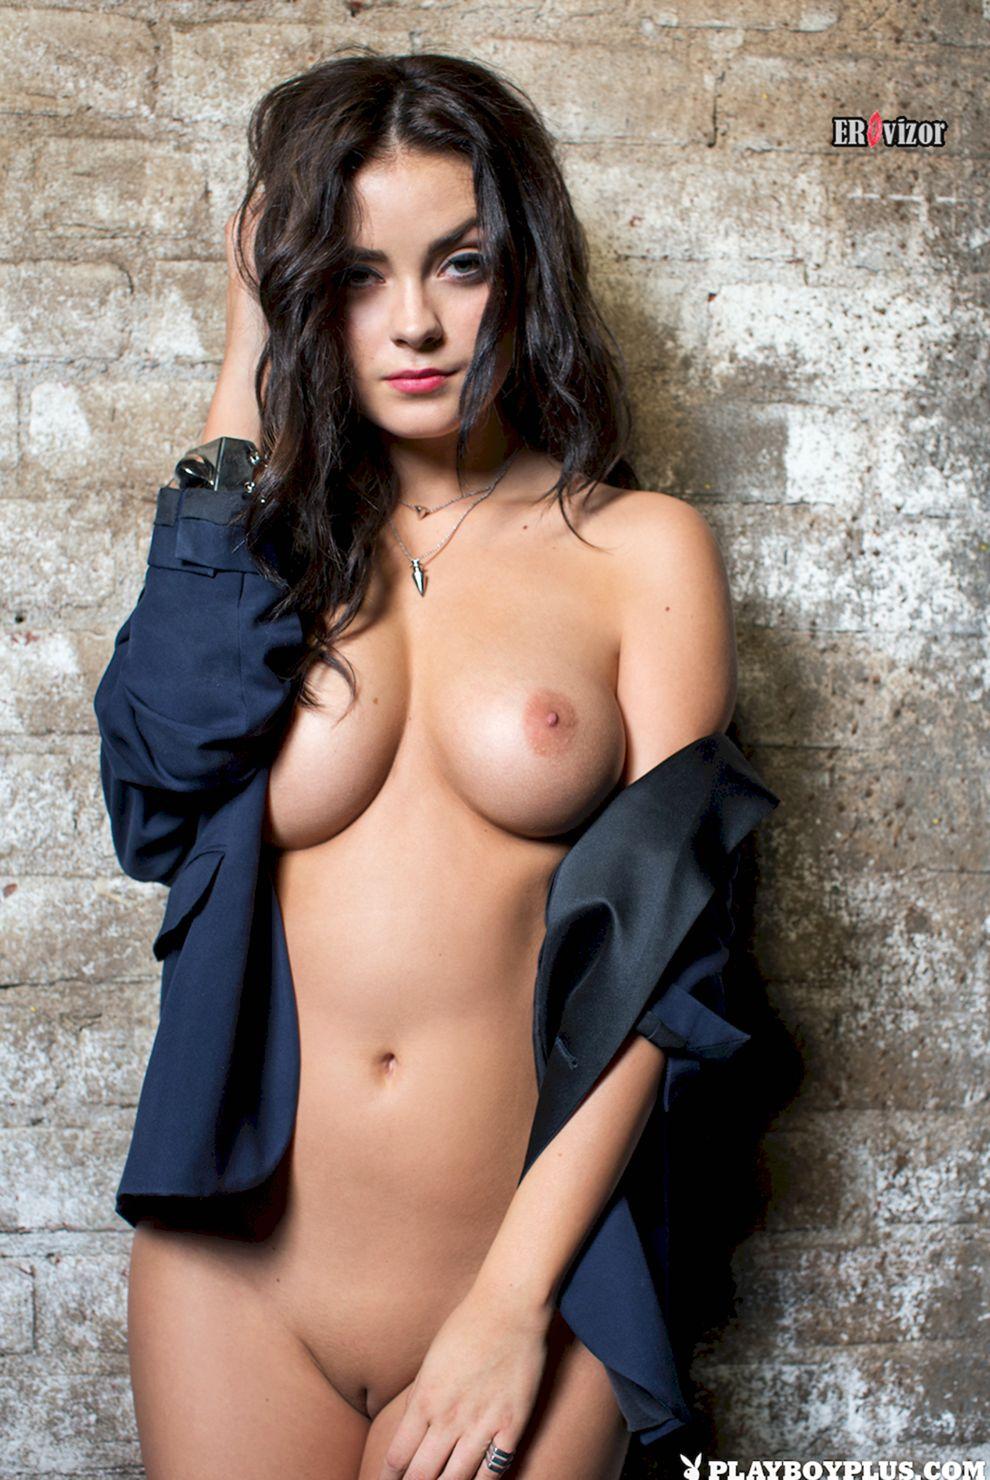 legkaya_erotica-erovizor (41)